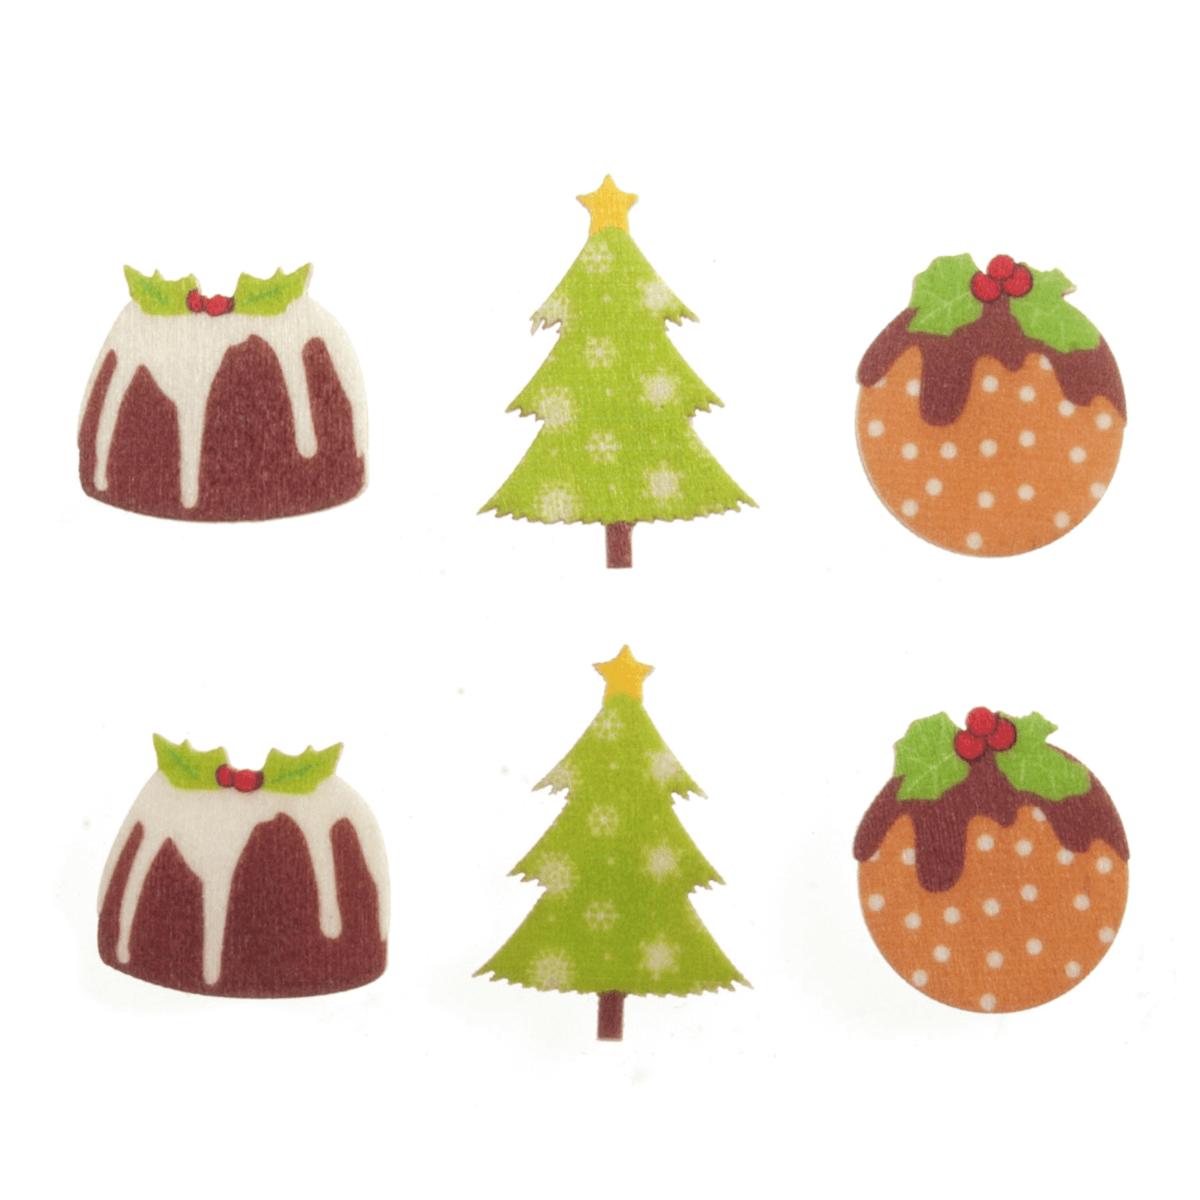 10 x Christmas Wooden Pud & Tree Embellishments Scrap booking